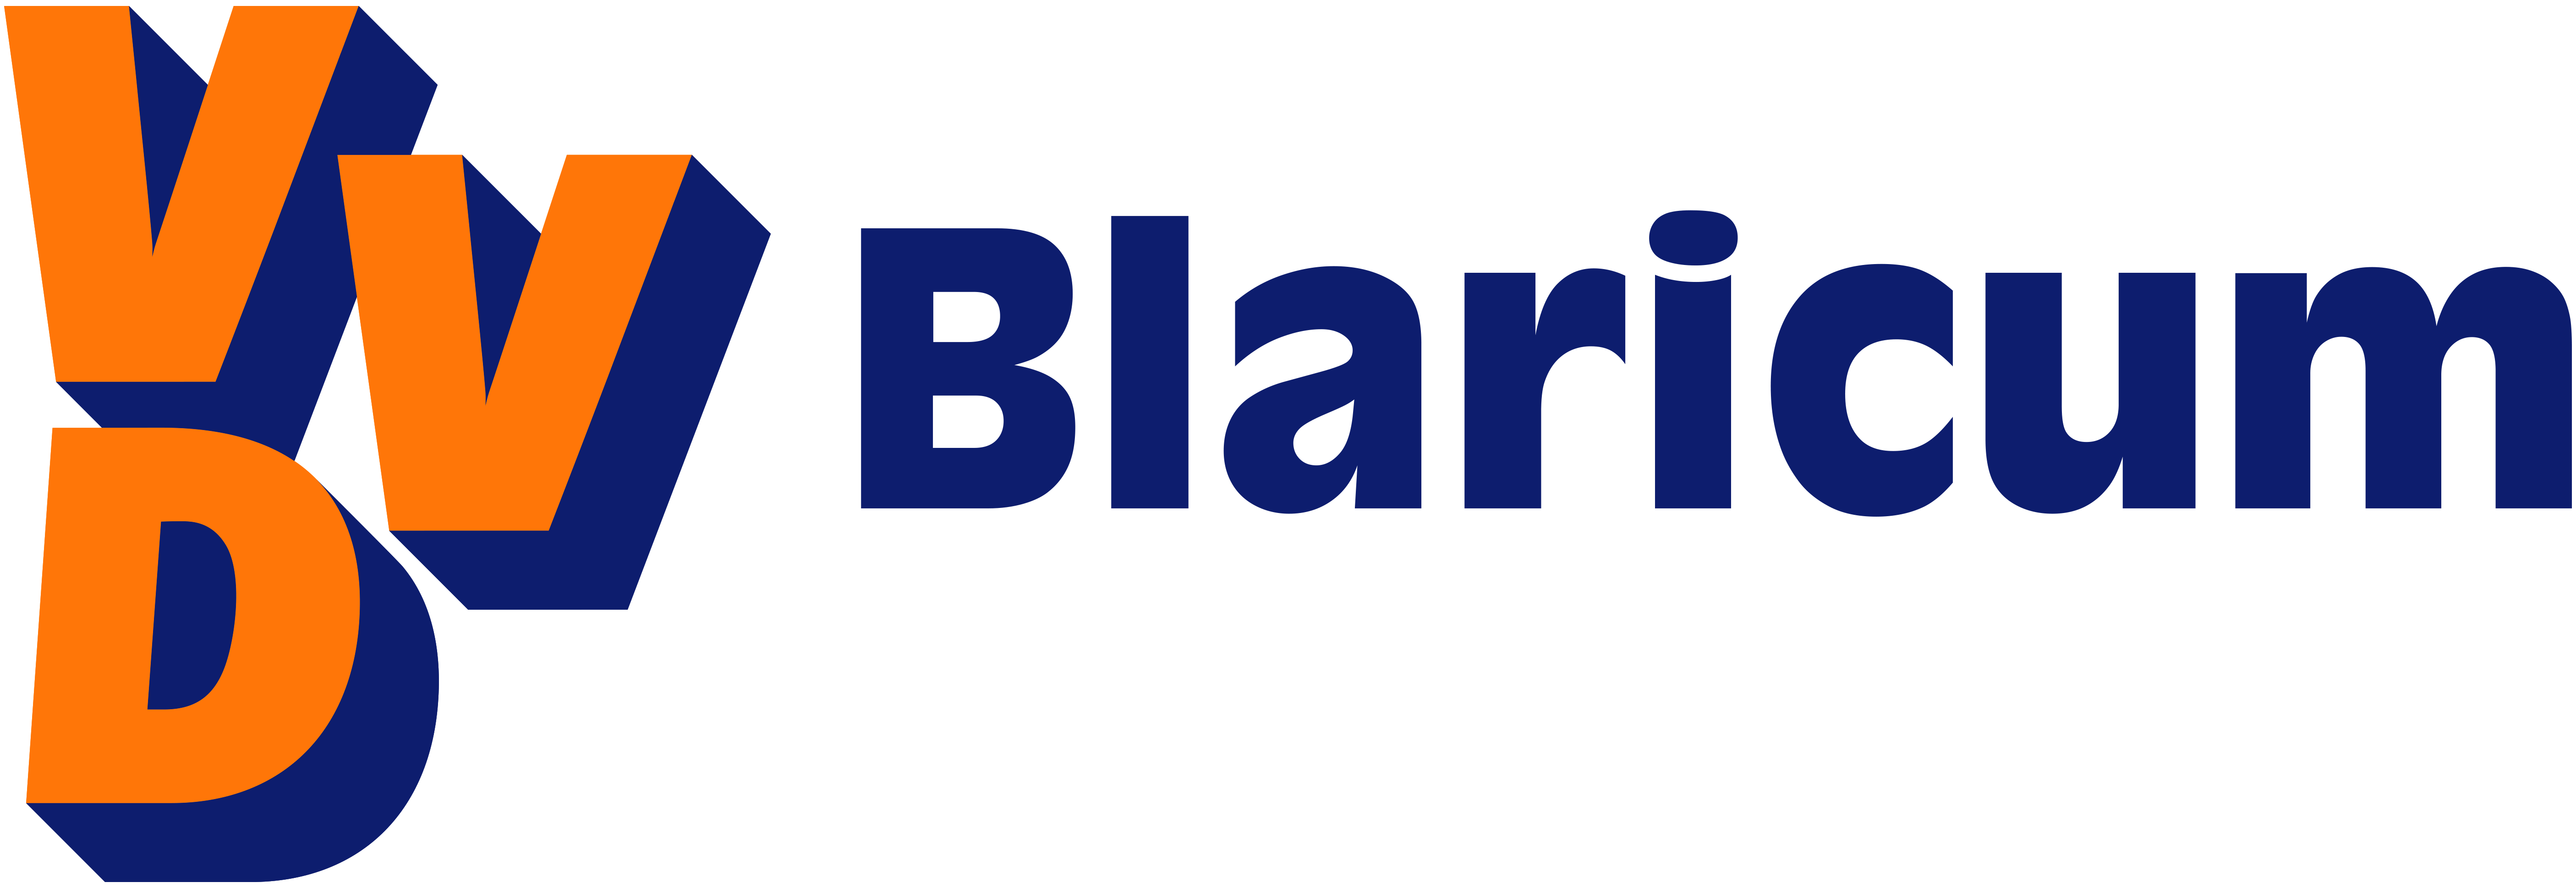 VVD Blaricum